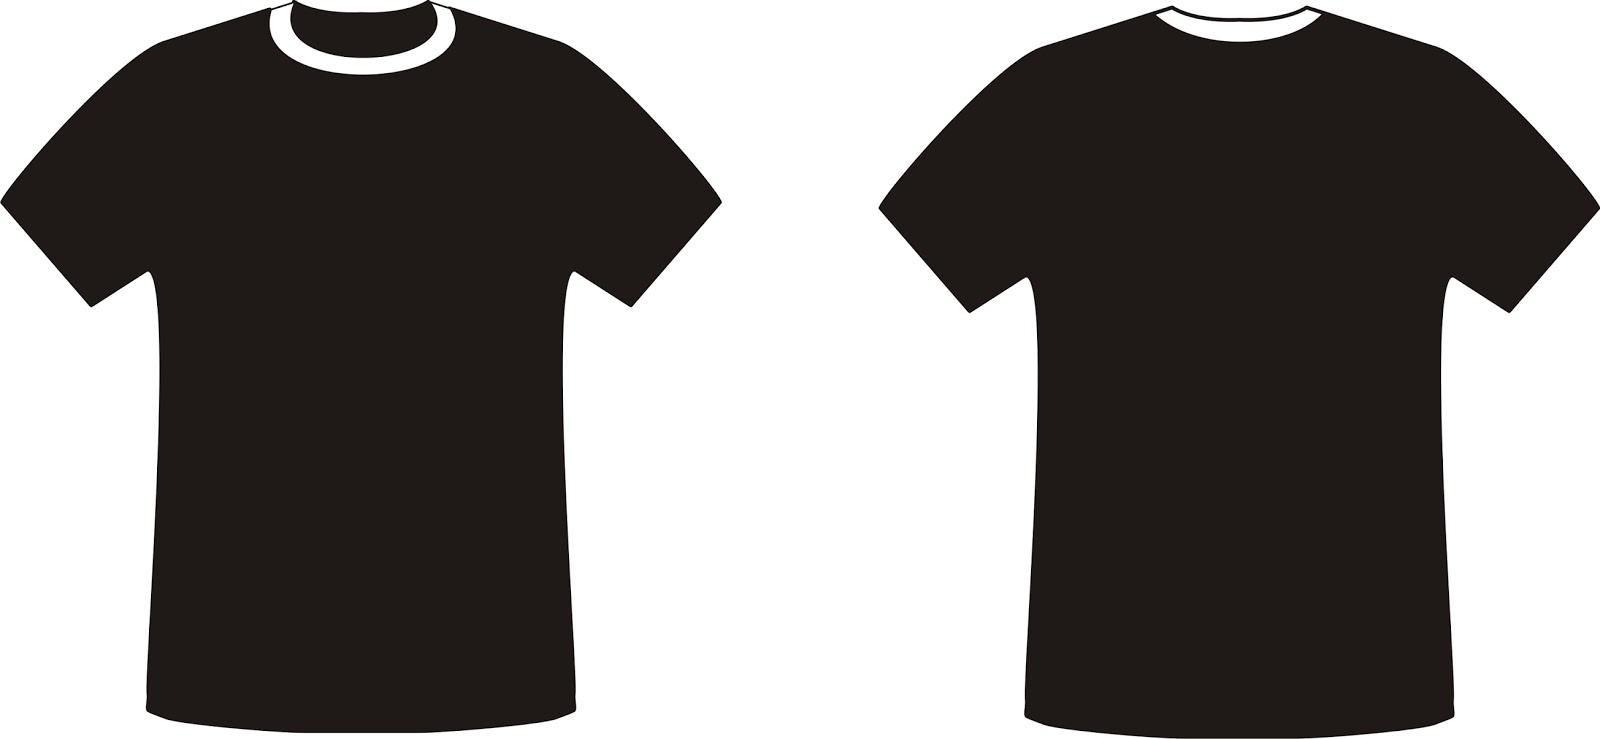 Ide 15 Contoh Kaos Polos Warna Hitam